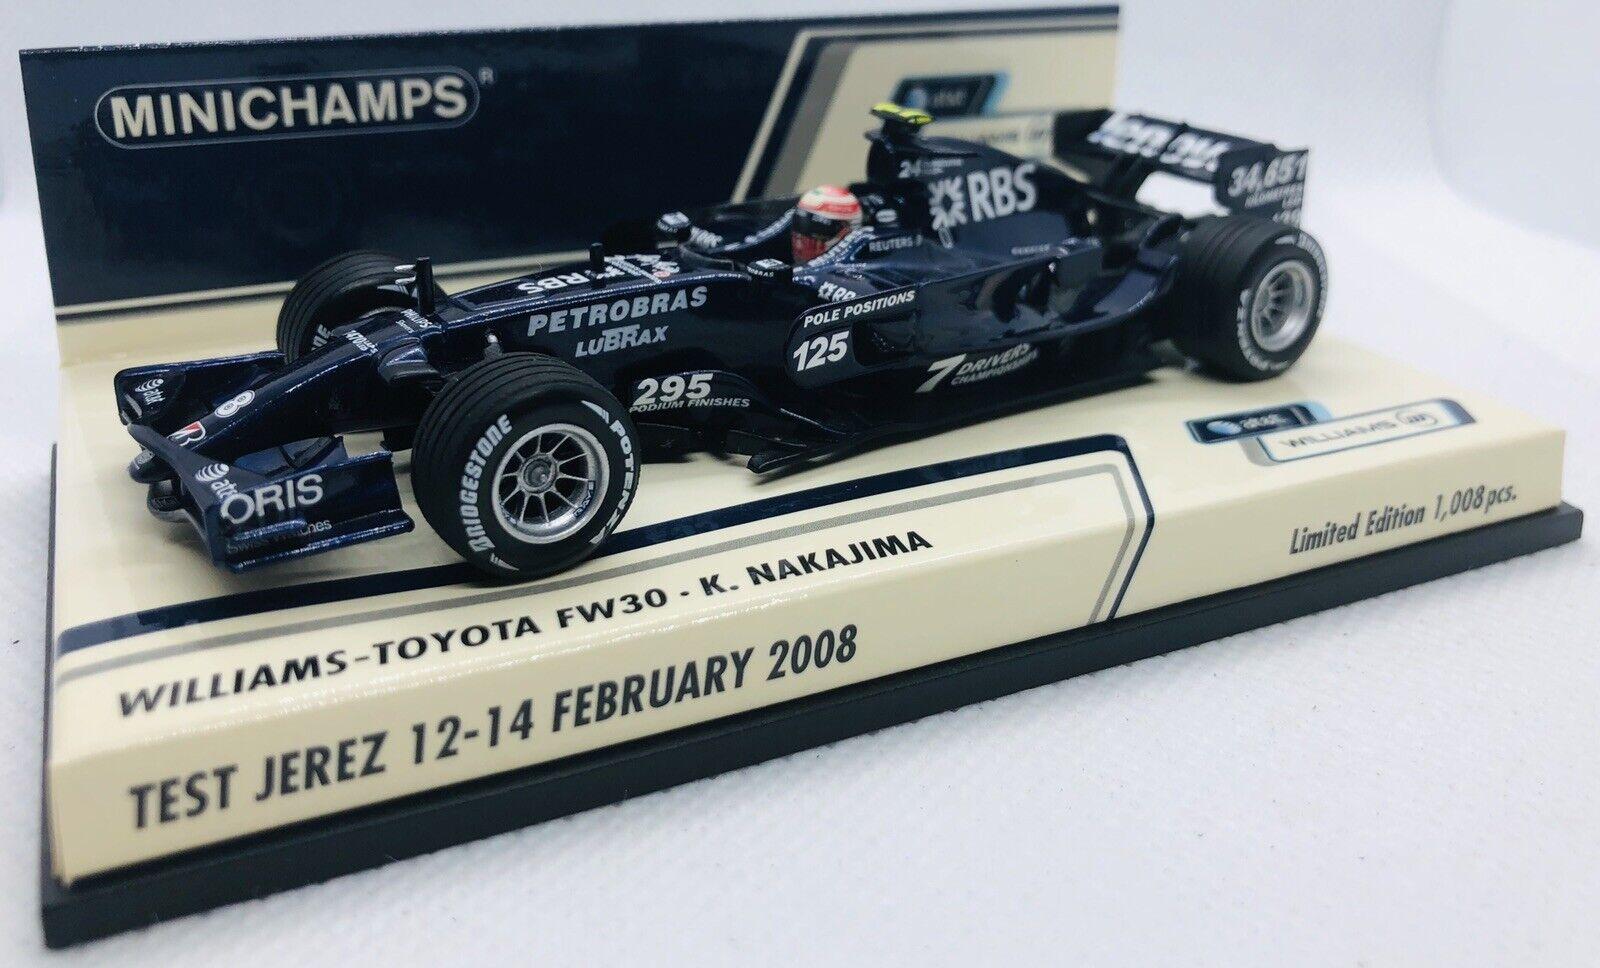 Nakajima fórmula 1 2008-1:43 Minichamps Williams-toyota FW 30 nº 8 K